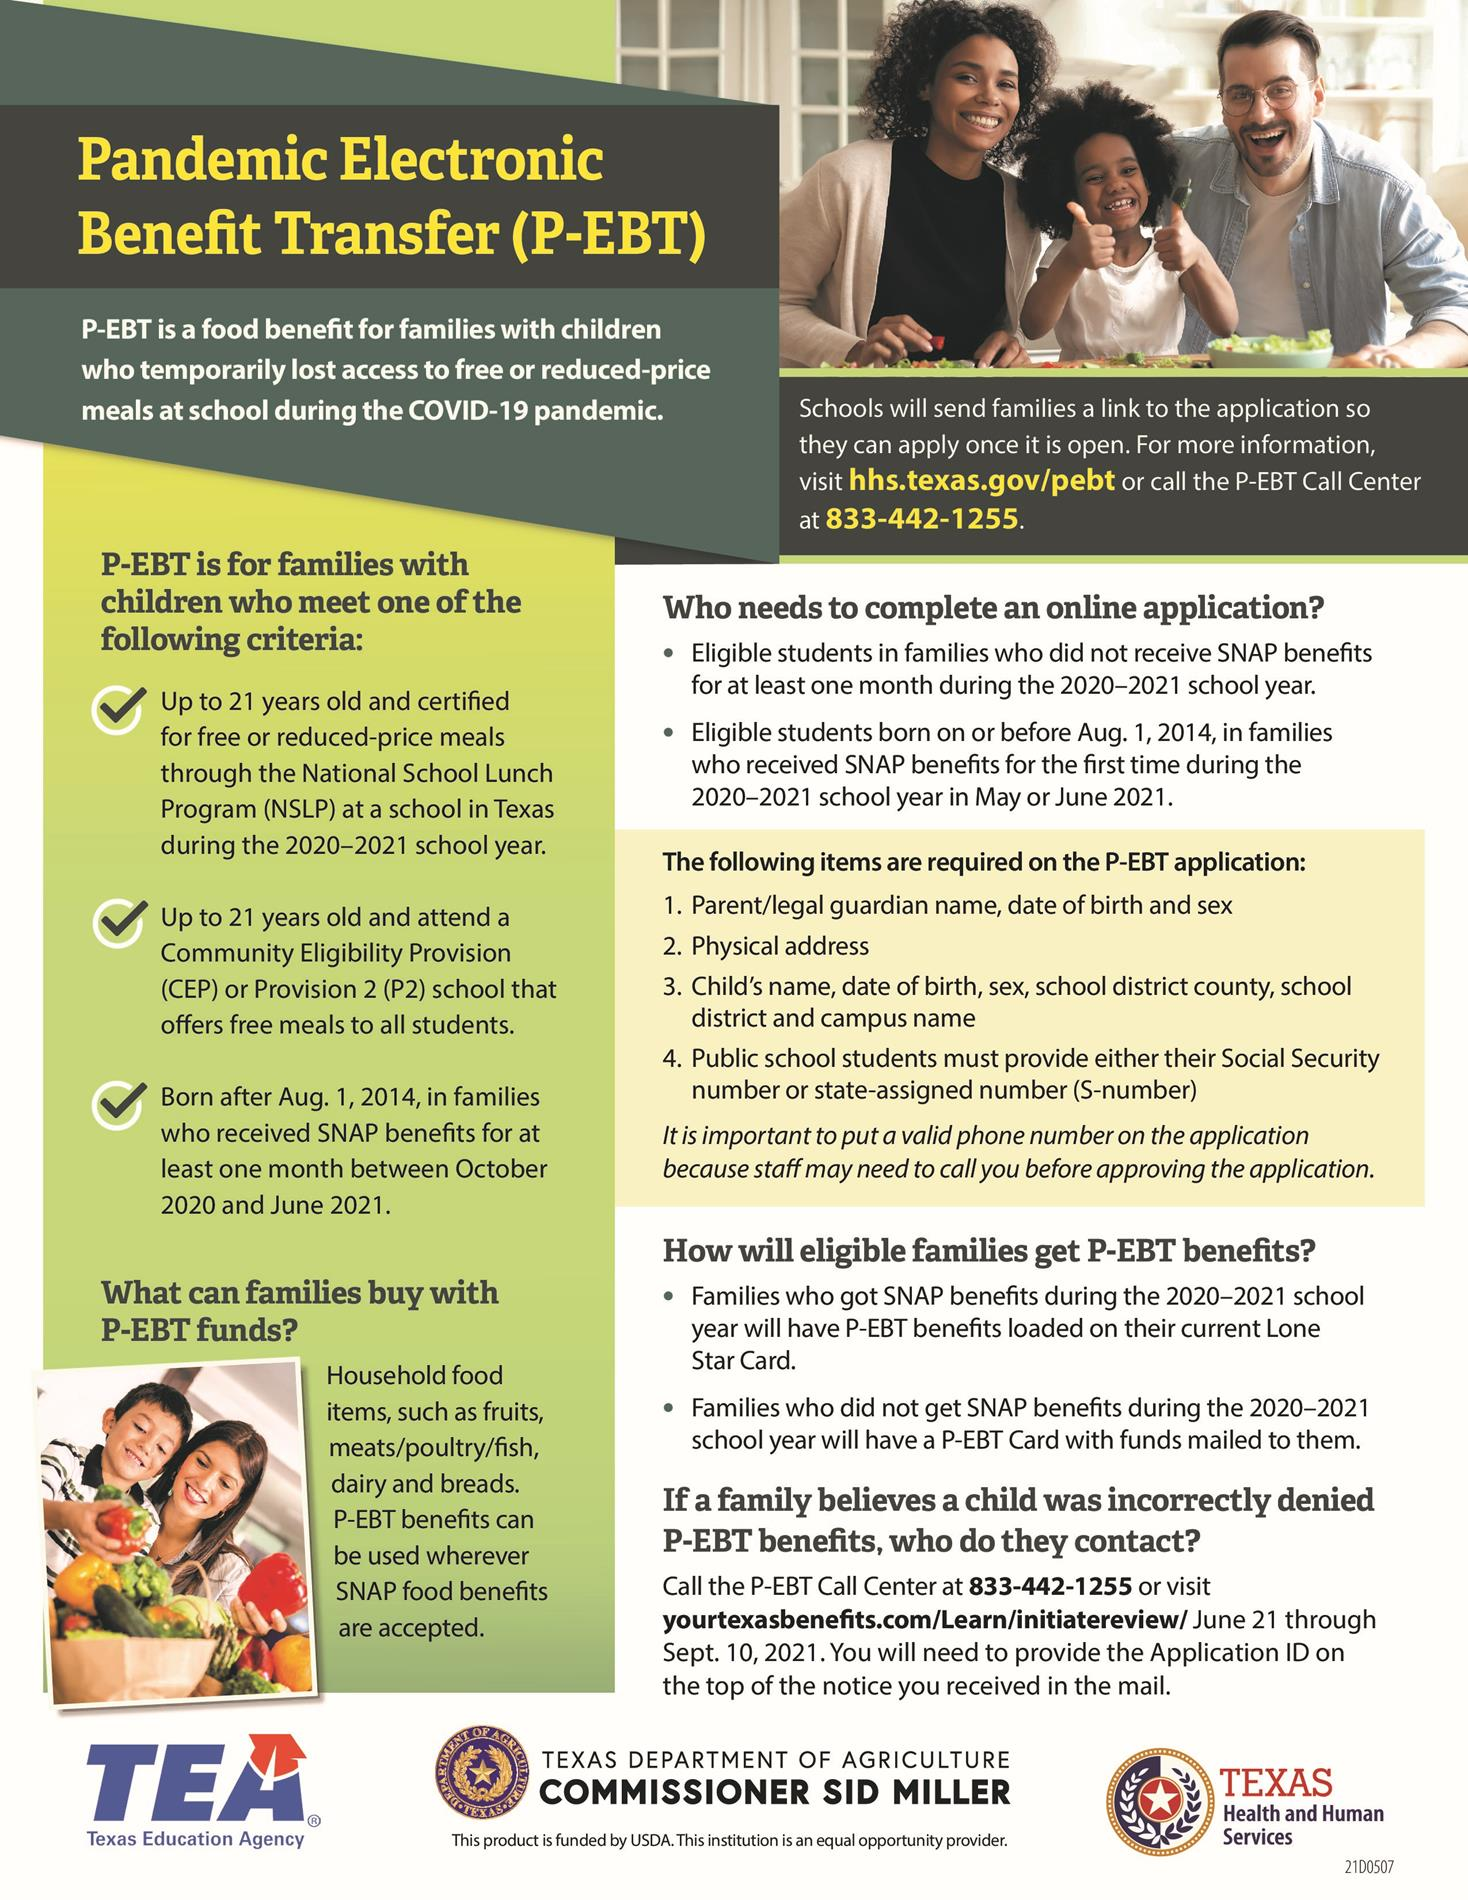 E-PBT information